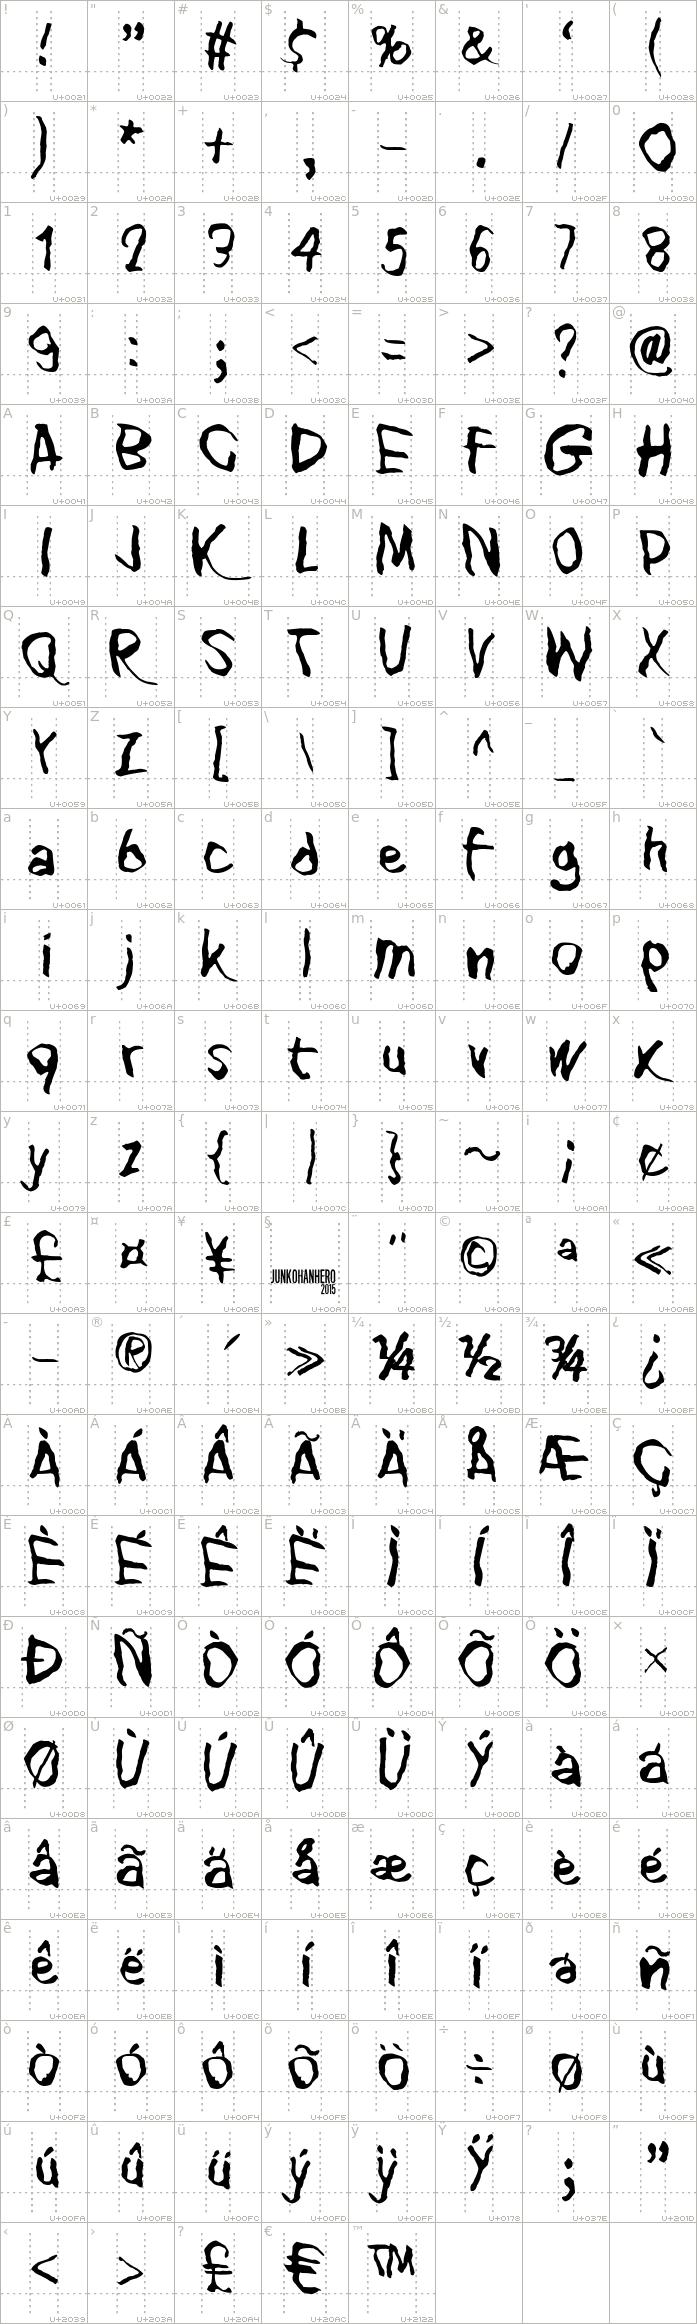 blank-eye.regular.character-map-1